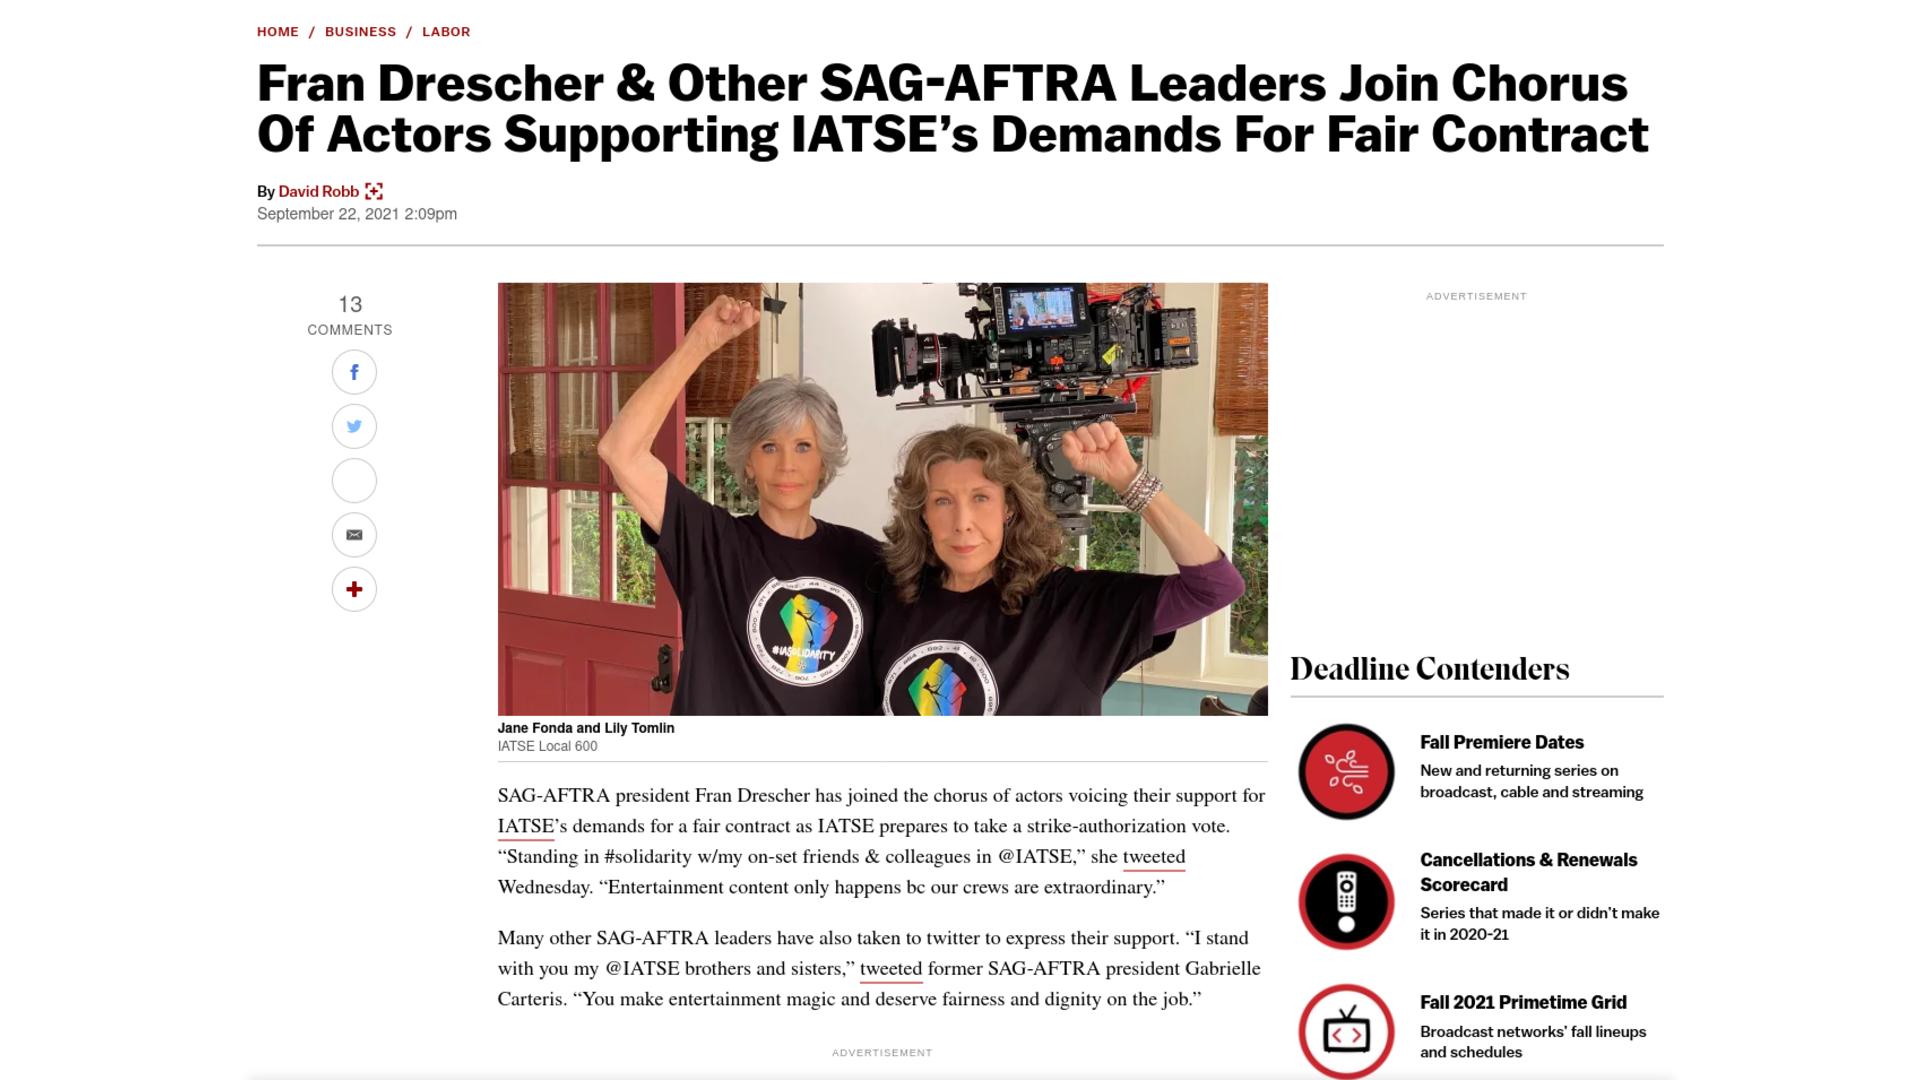 Fairness Rocks News Fran Drescher & Other SAG-AFTRA Leaders Join Chorus Of Actors Supporting IATSE's Demands For Fair Contract